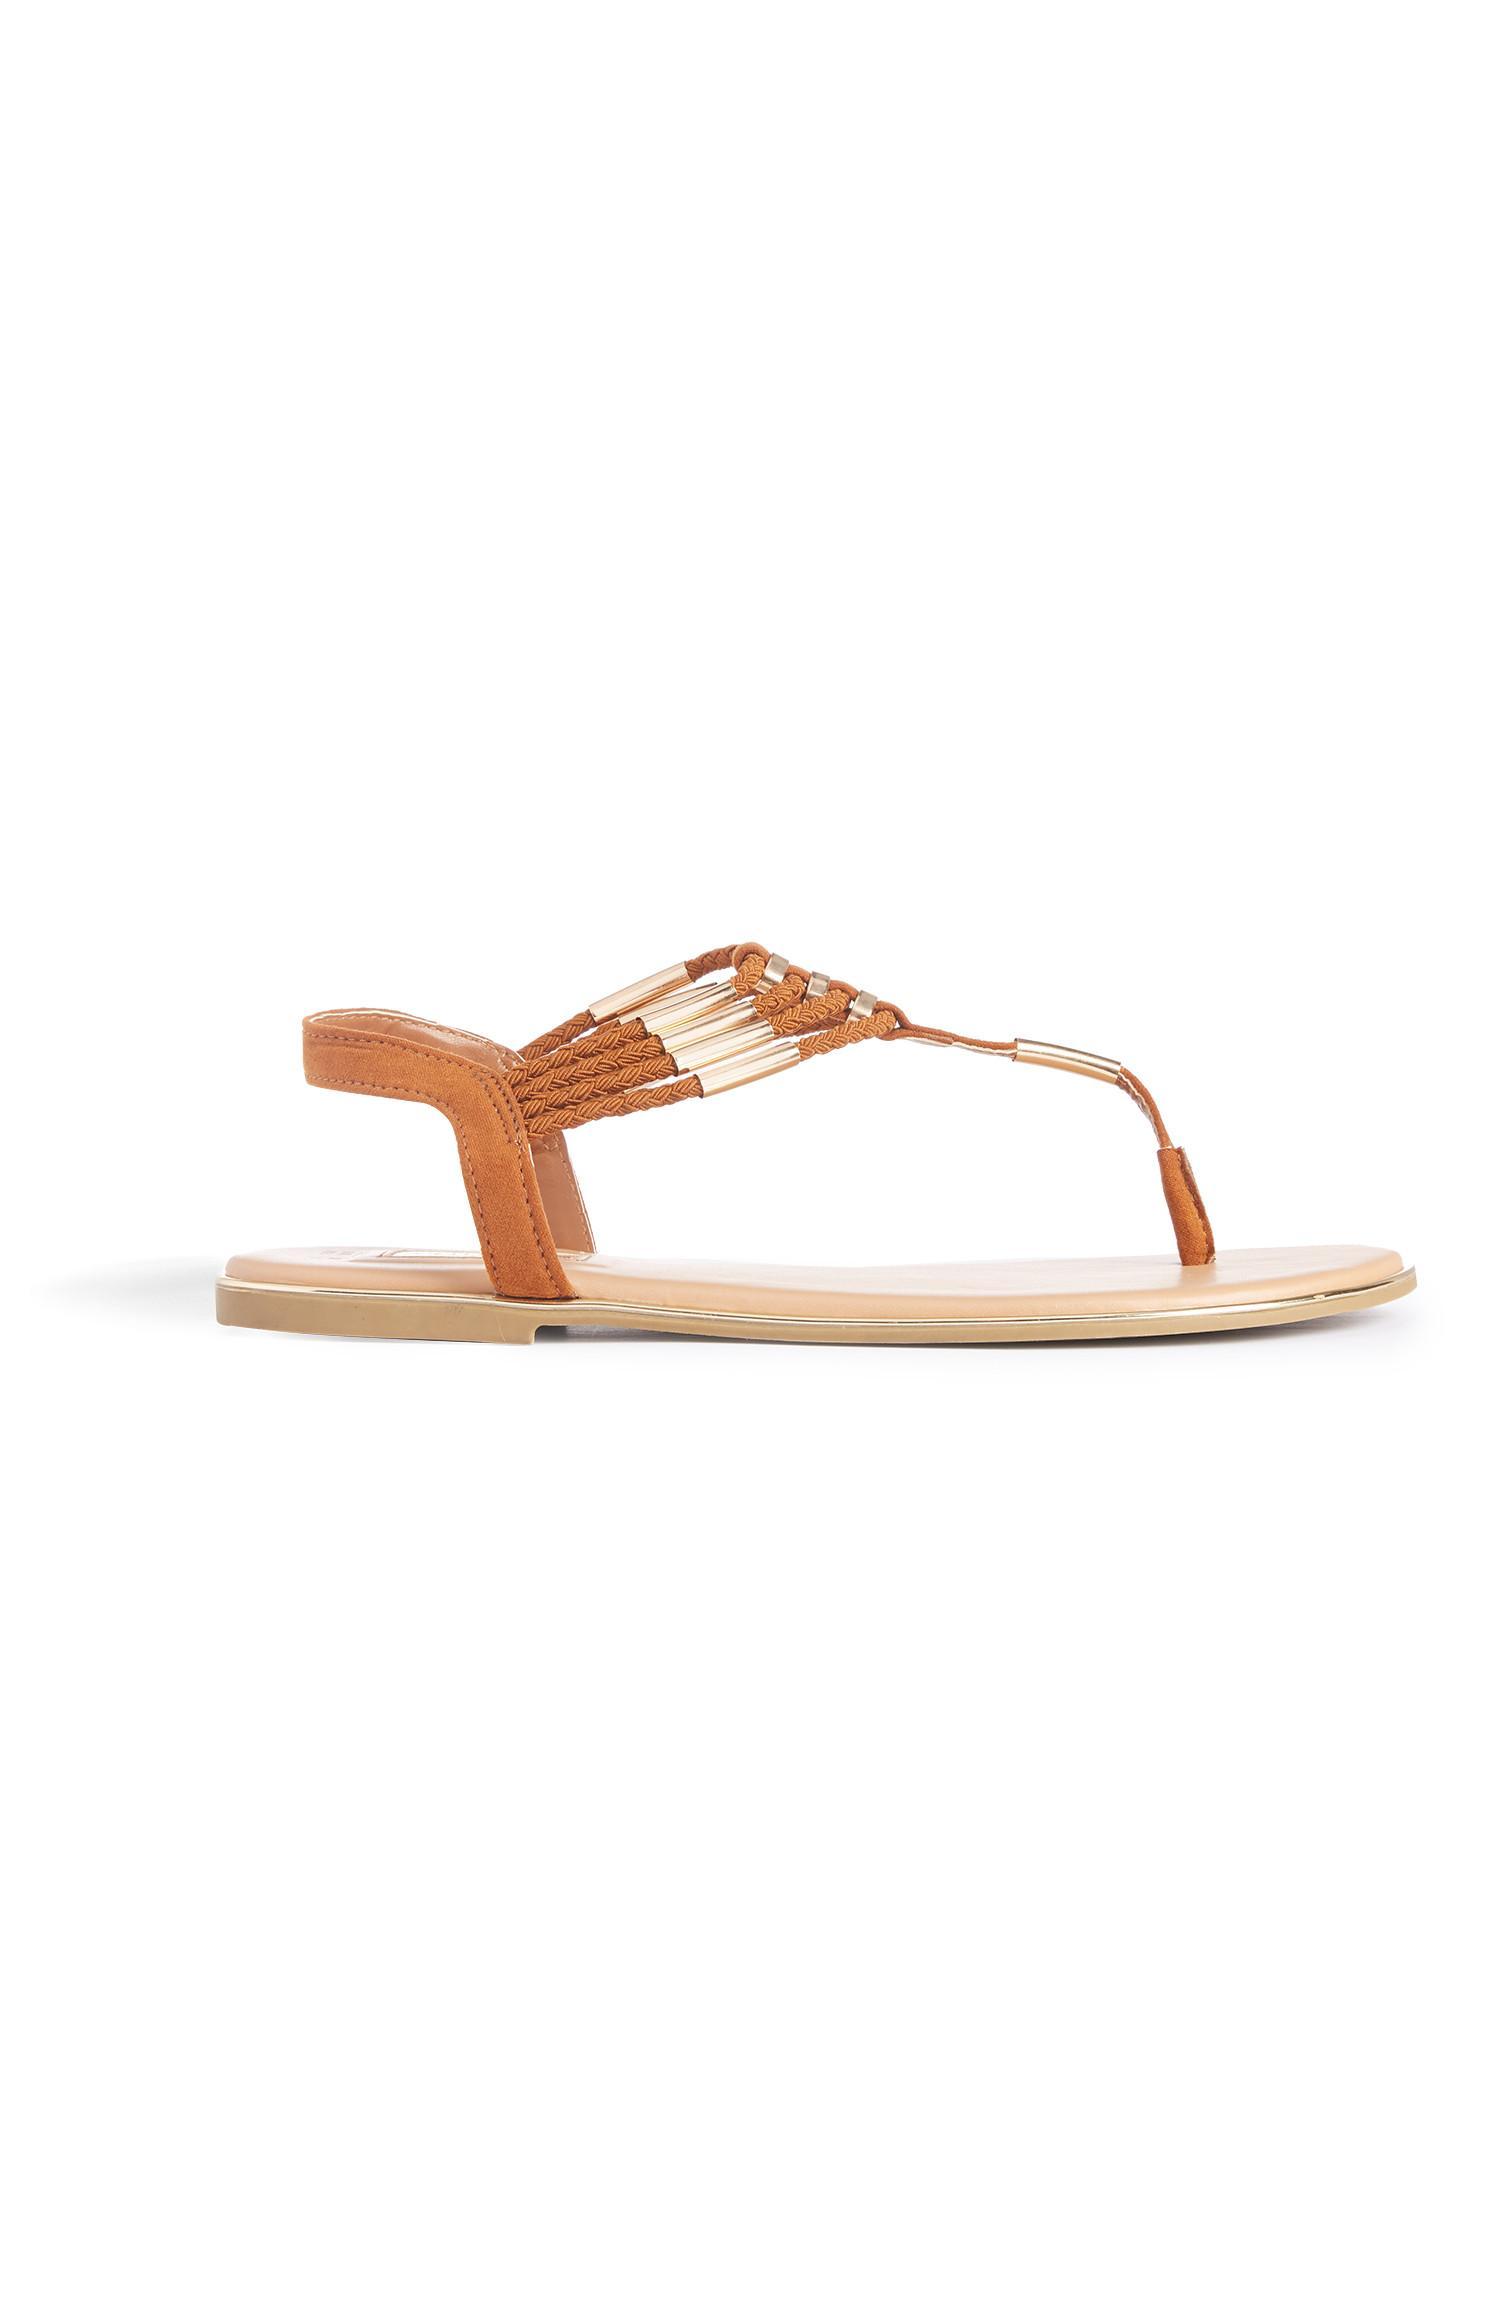 Tan Beaded Thong Sandals